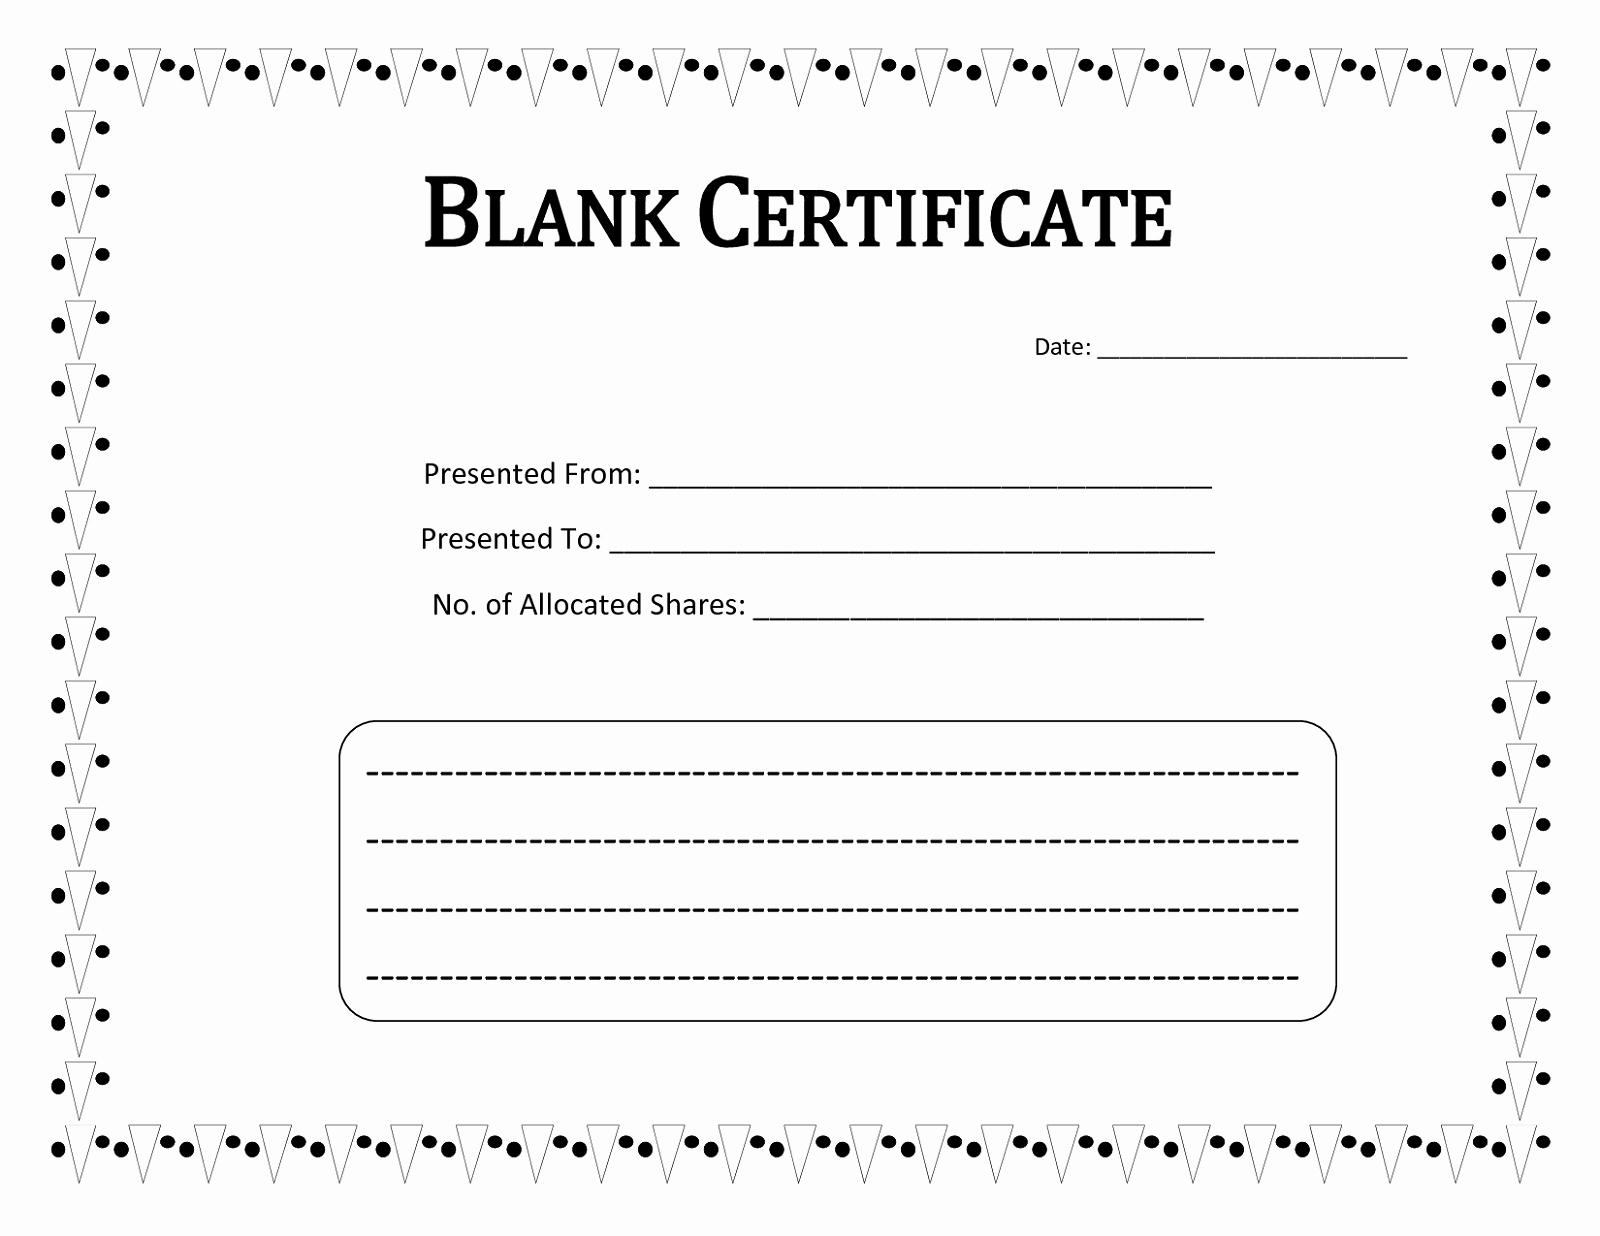 Free Printable Blank Certificates Beautiful Blank Certificate Templates to Print